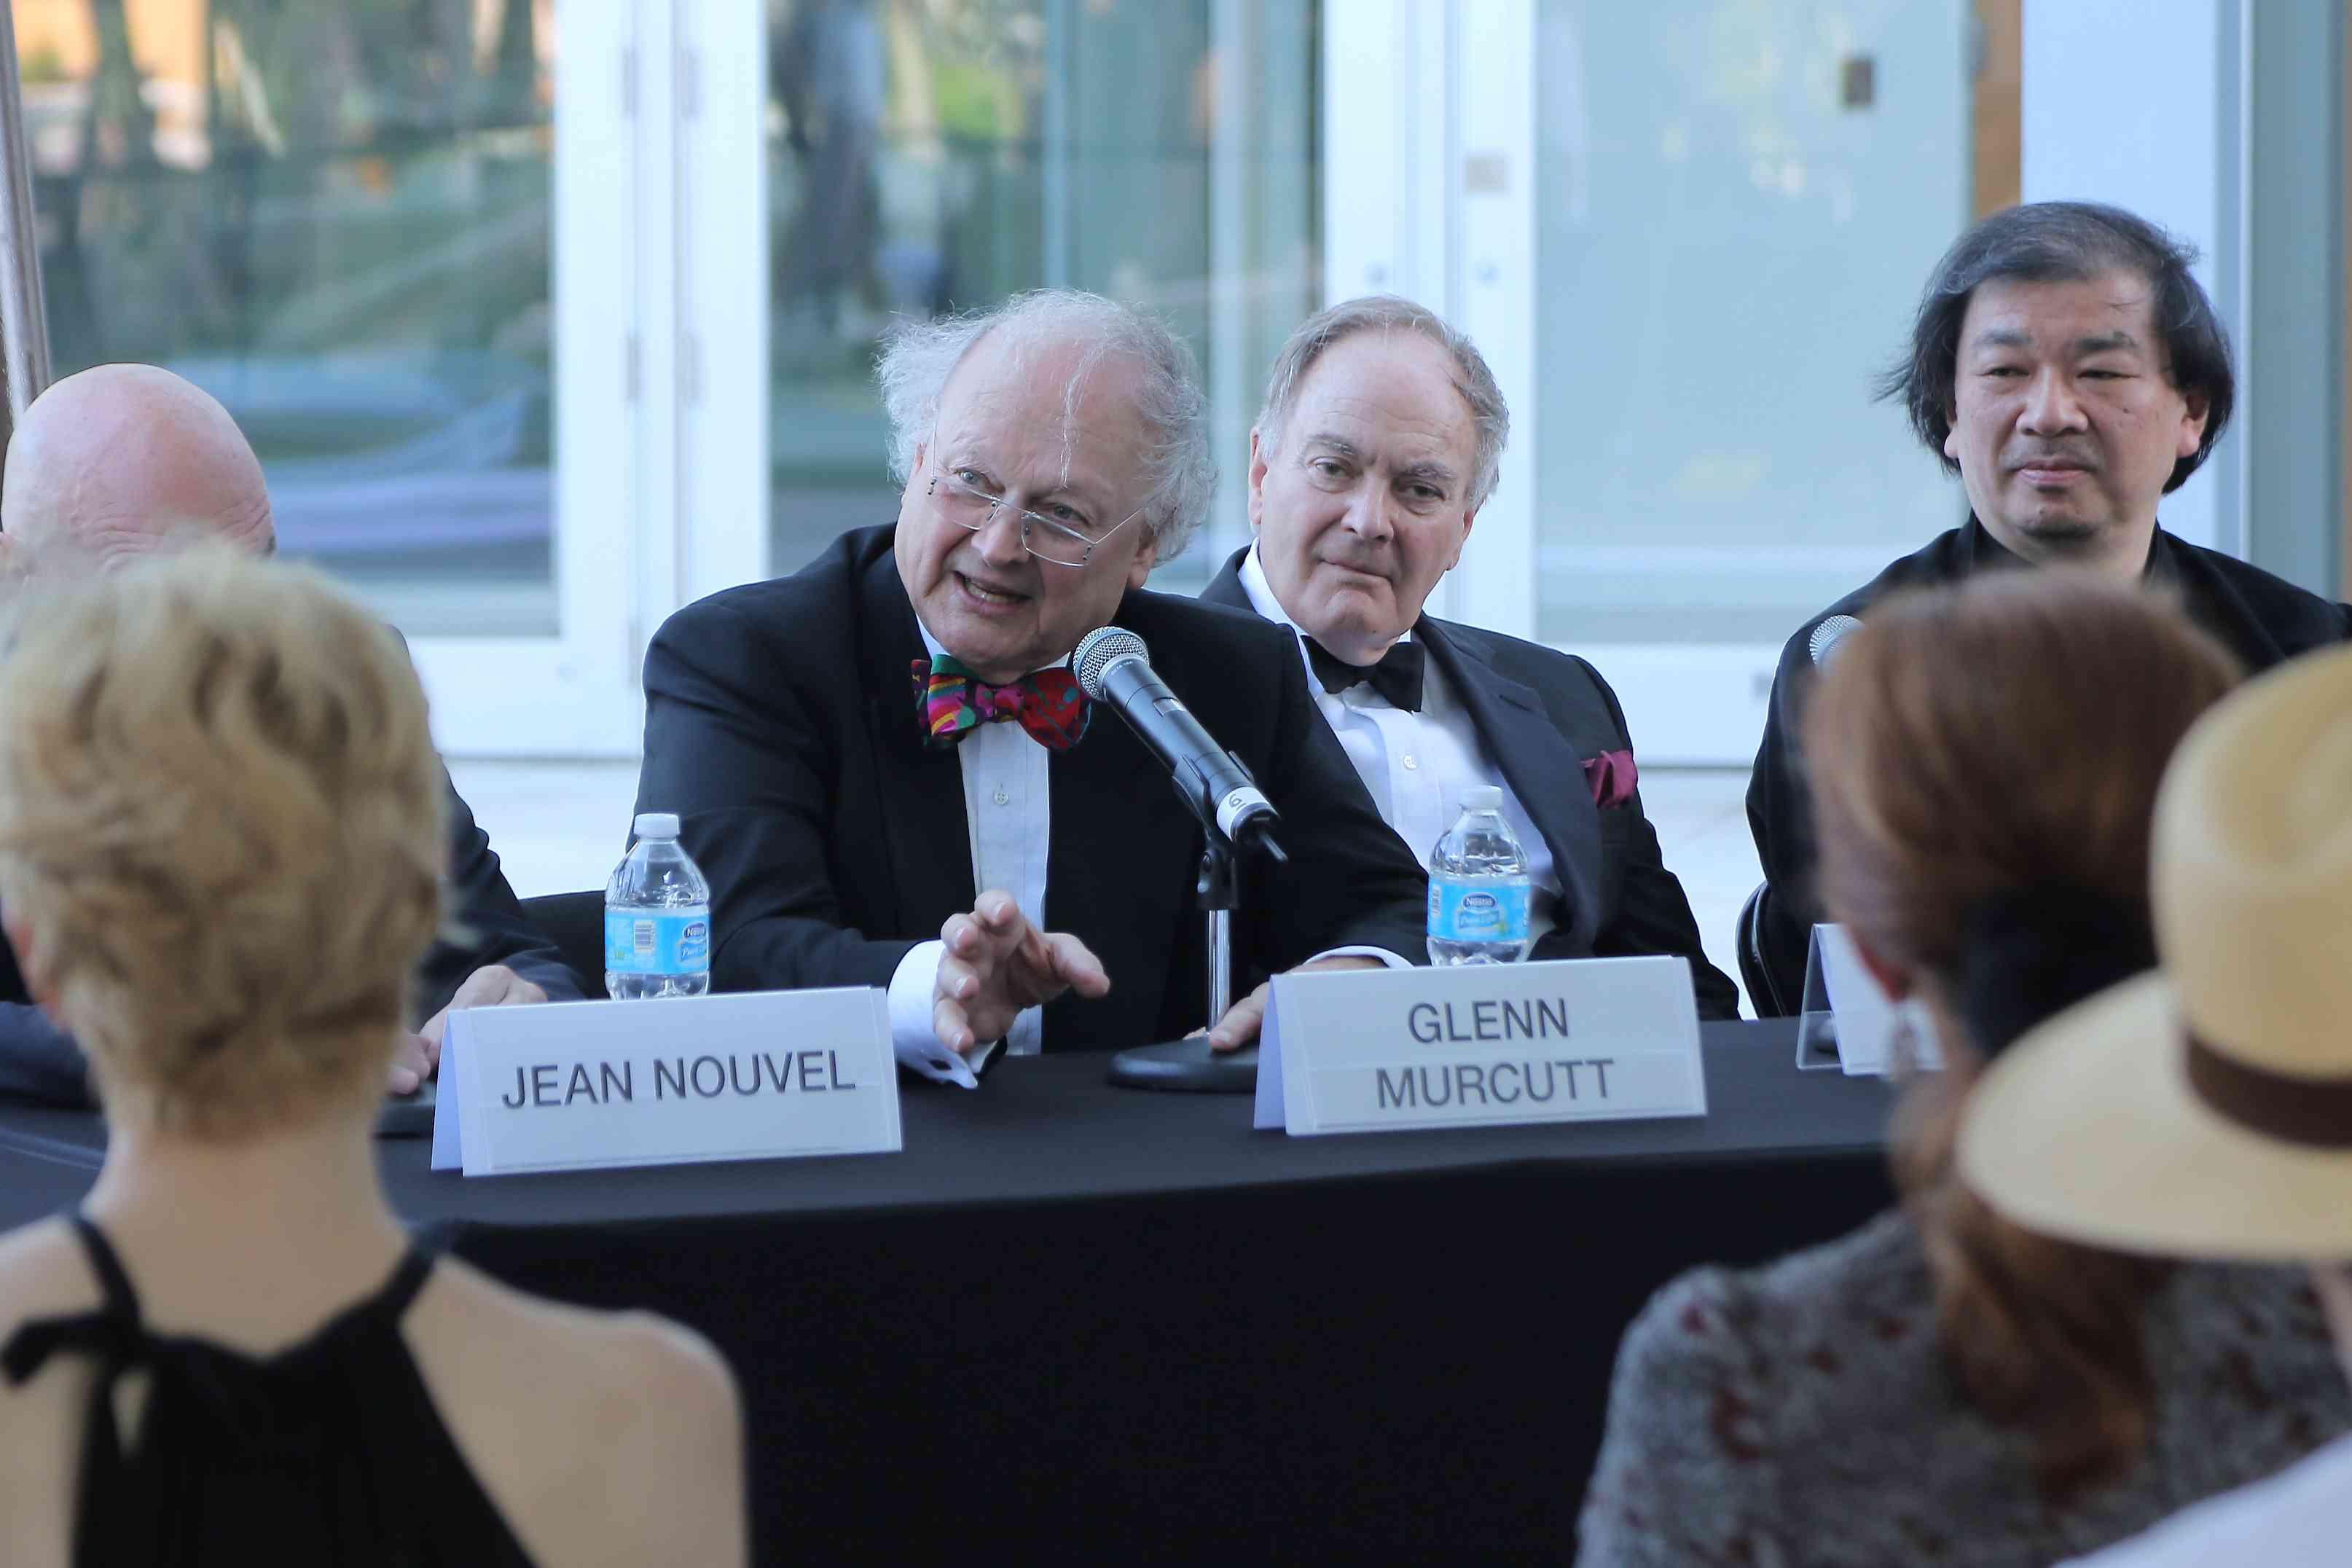 Pritzker Architecture Prize 2015 Award Ceremony